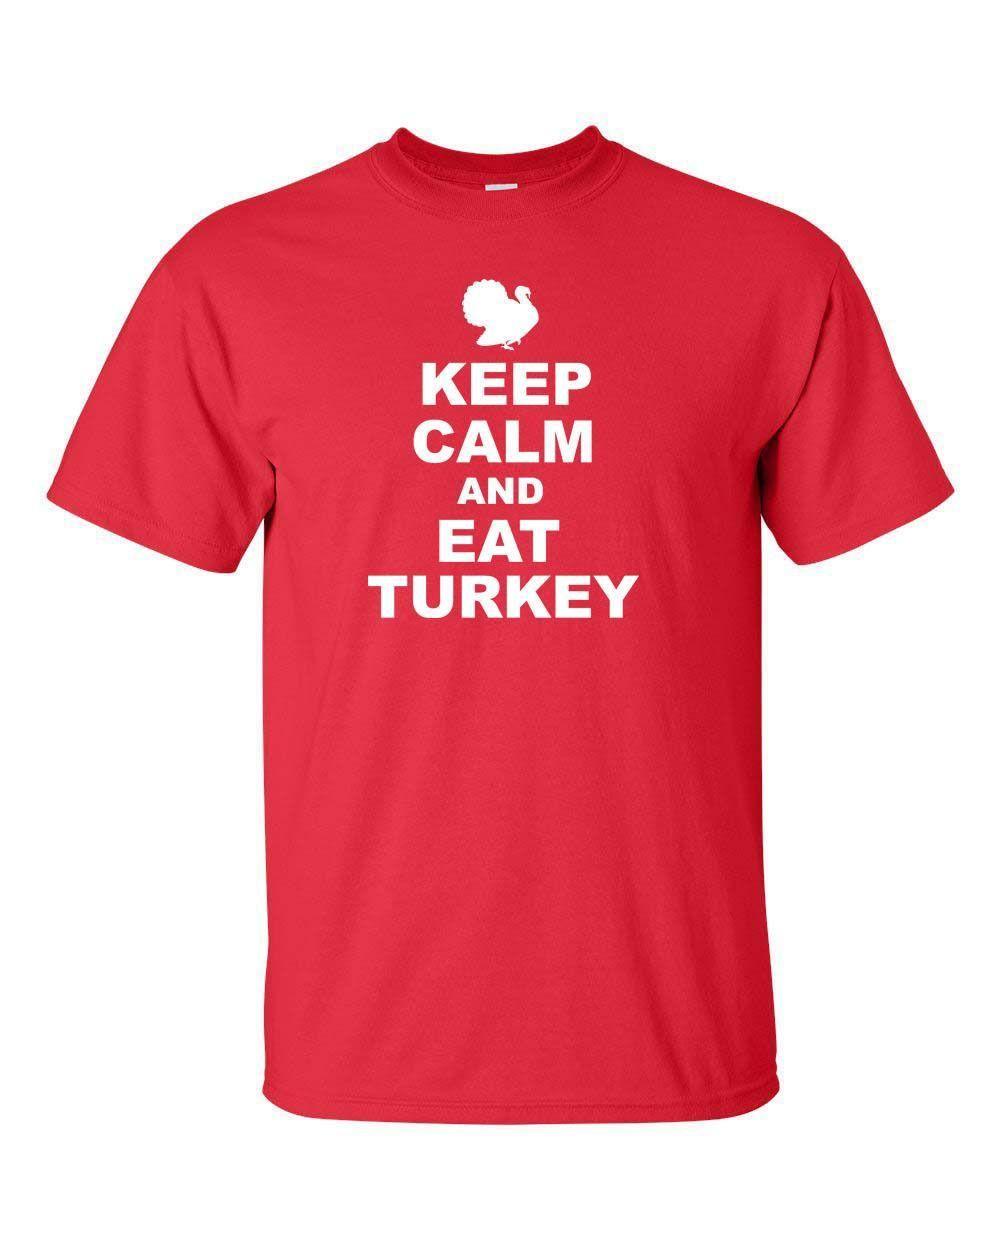 472d3f3ec94b0 Keep Calm And Eat Turkey Thanksgiving Holiday Dinner Funny Men'S Tee Shirt  Best T Shirt Sites T Shirt Shopping From Linnan0006, $14.67| DHgate.Com